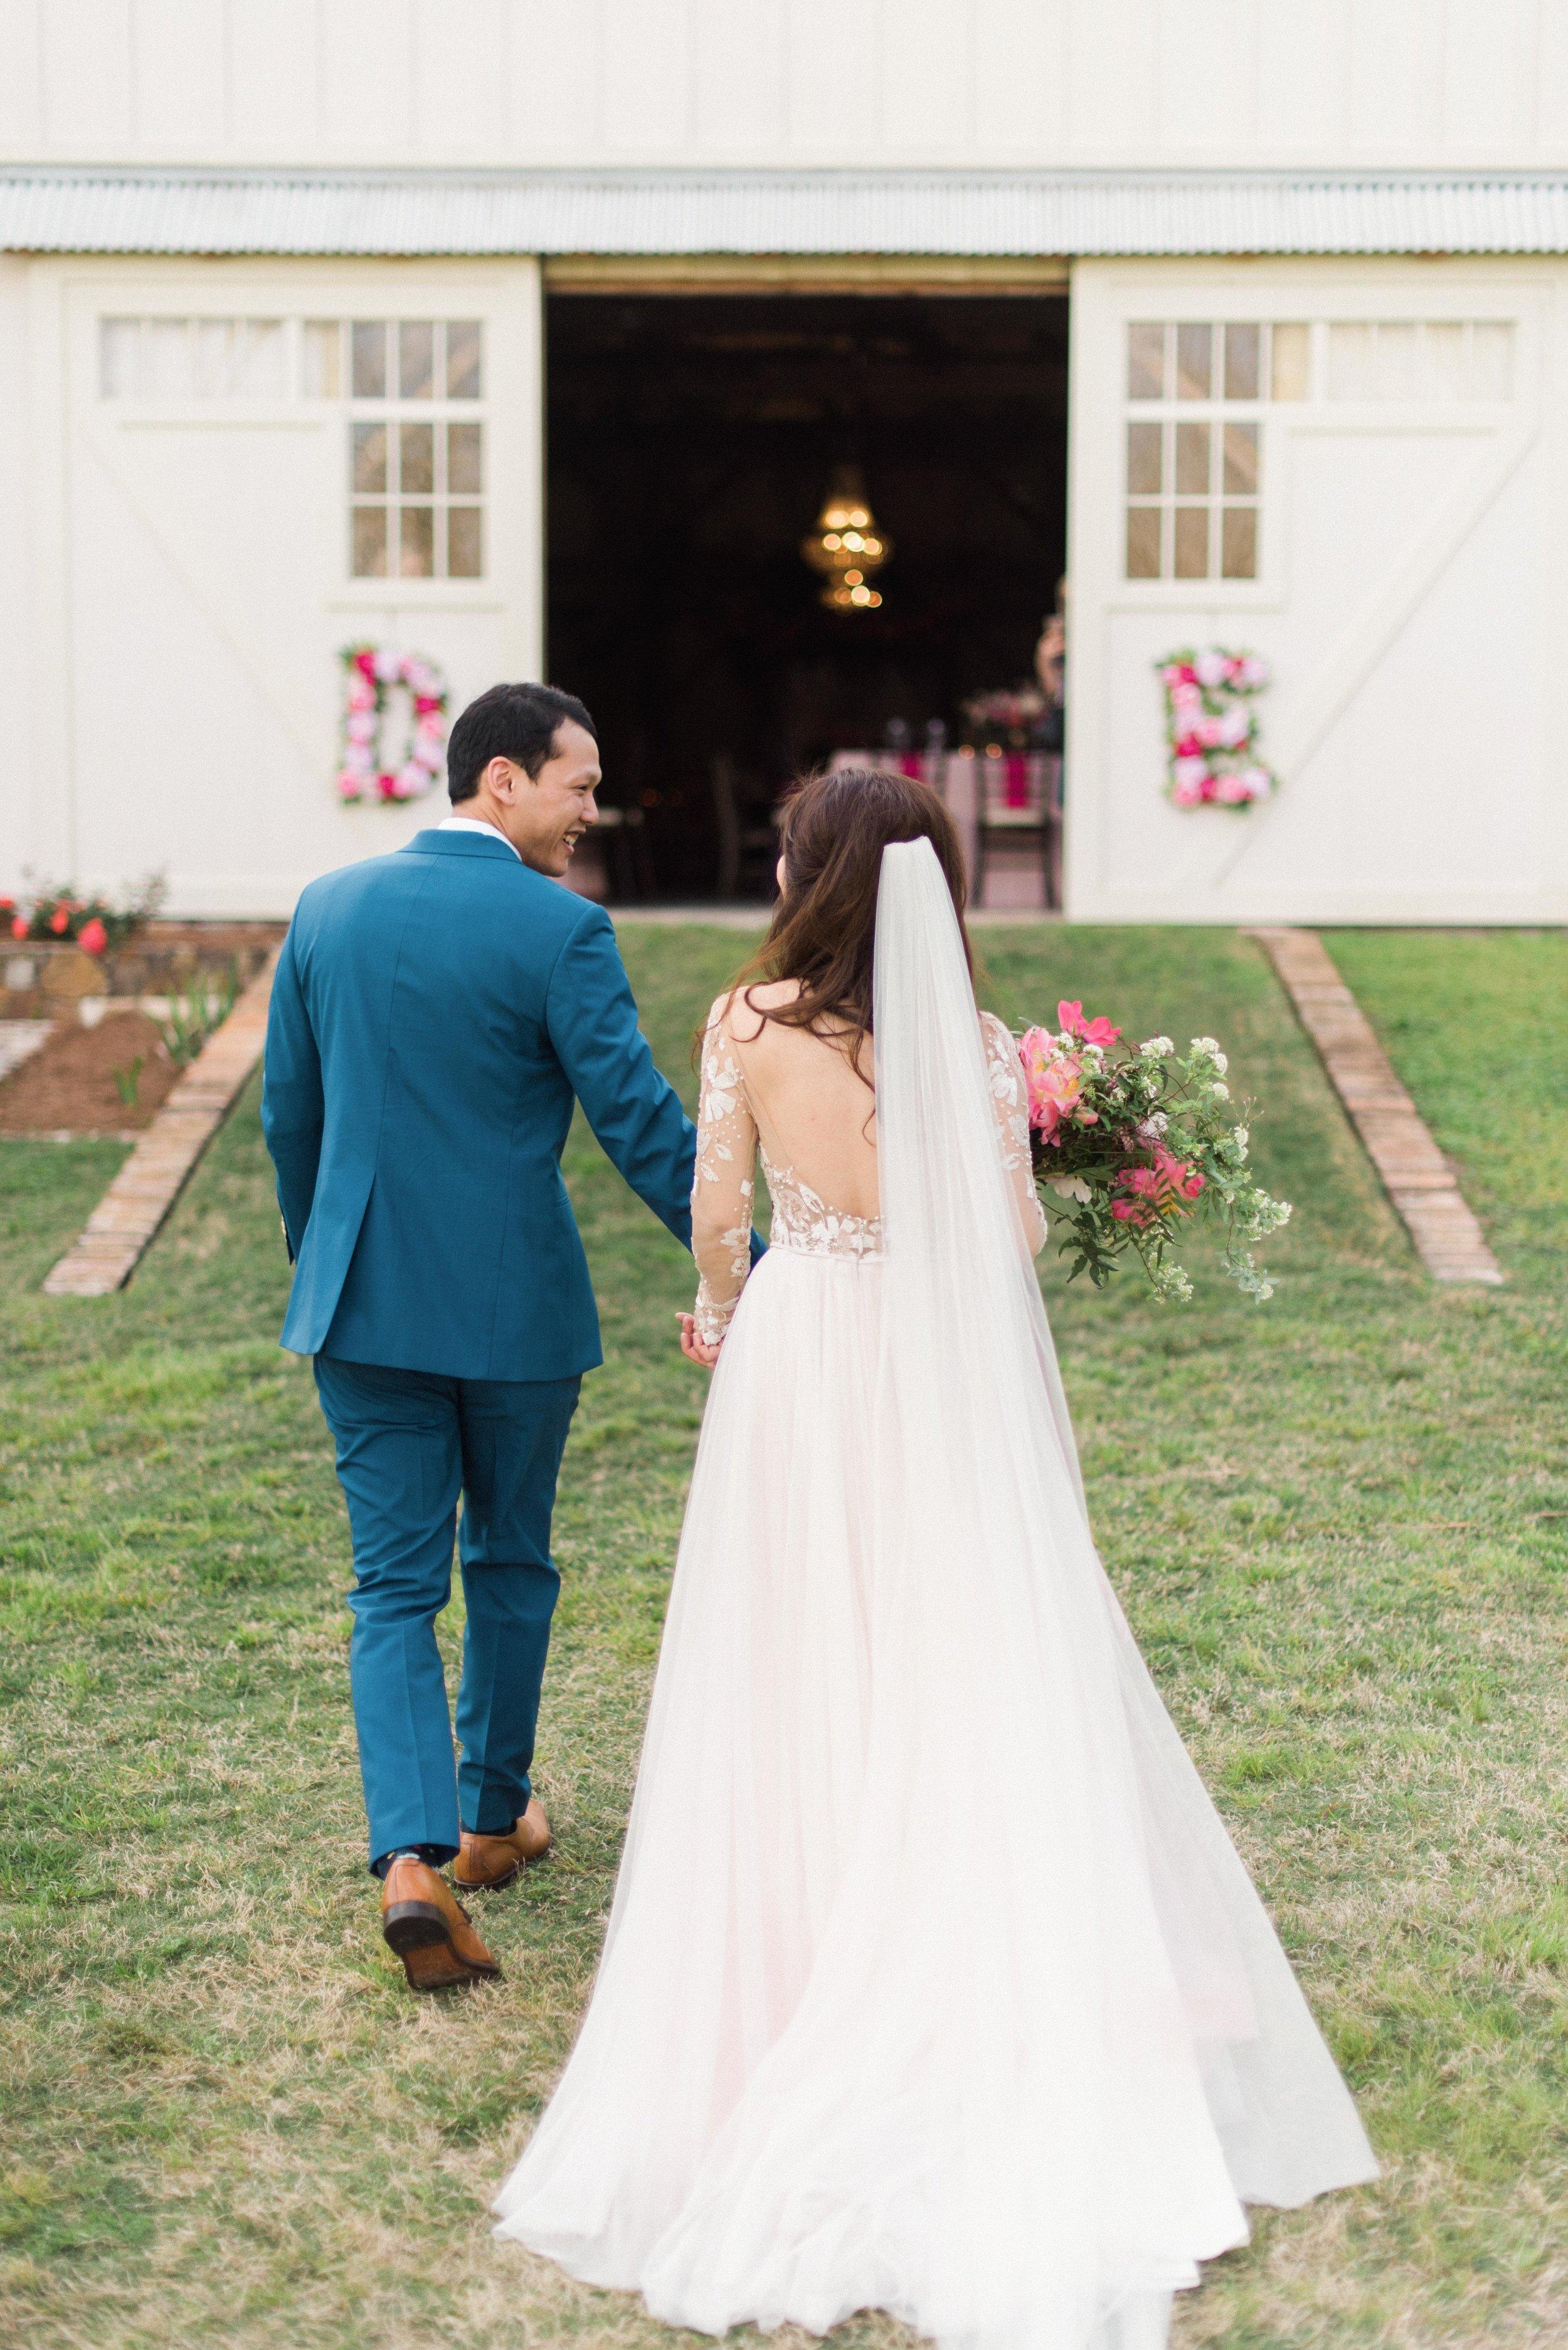 The-Knot-50-Weddings-50-States-Texas-Winner-Dana-Fernandez-photography-houston-wedding-photographer-film-fine-art-destination-31.jpg